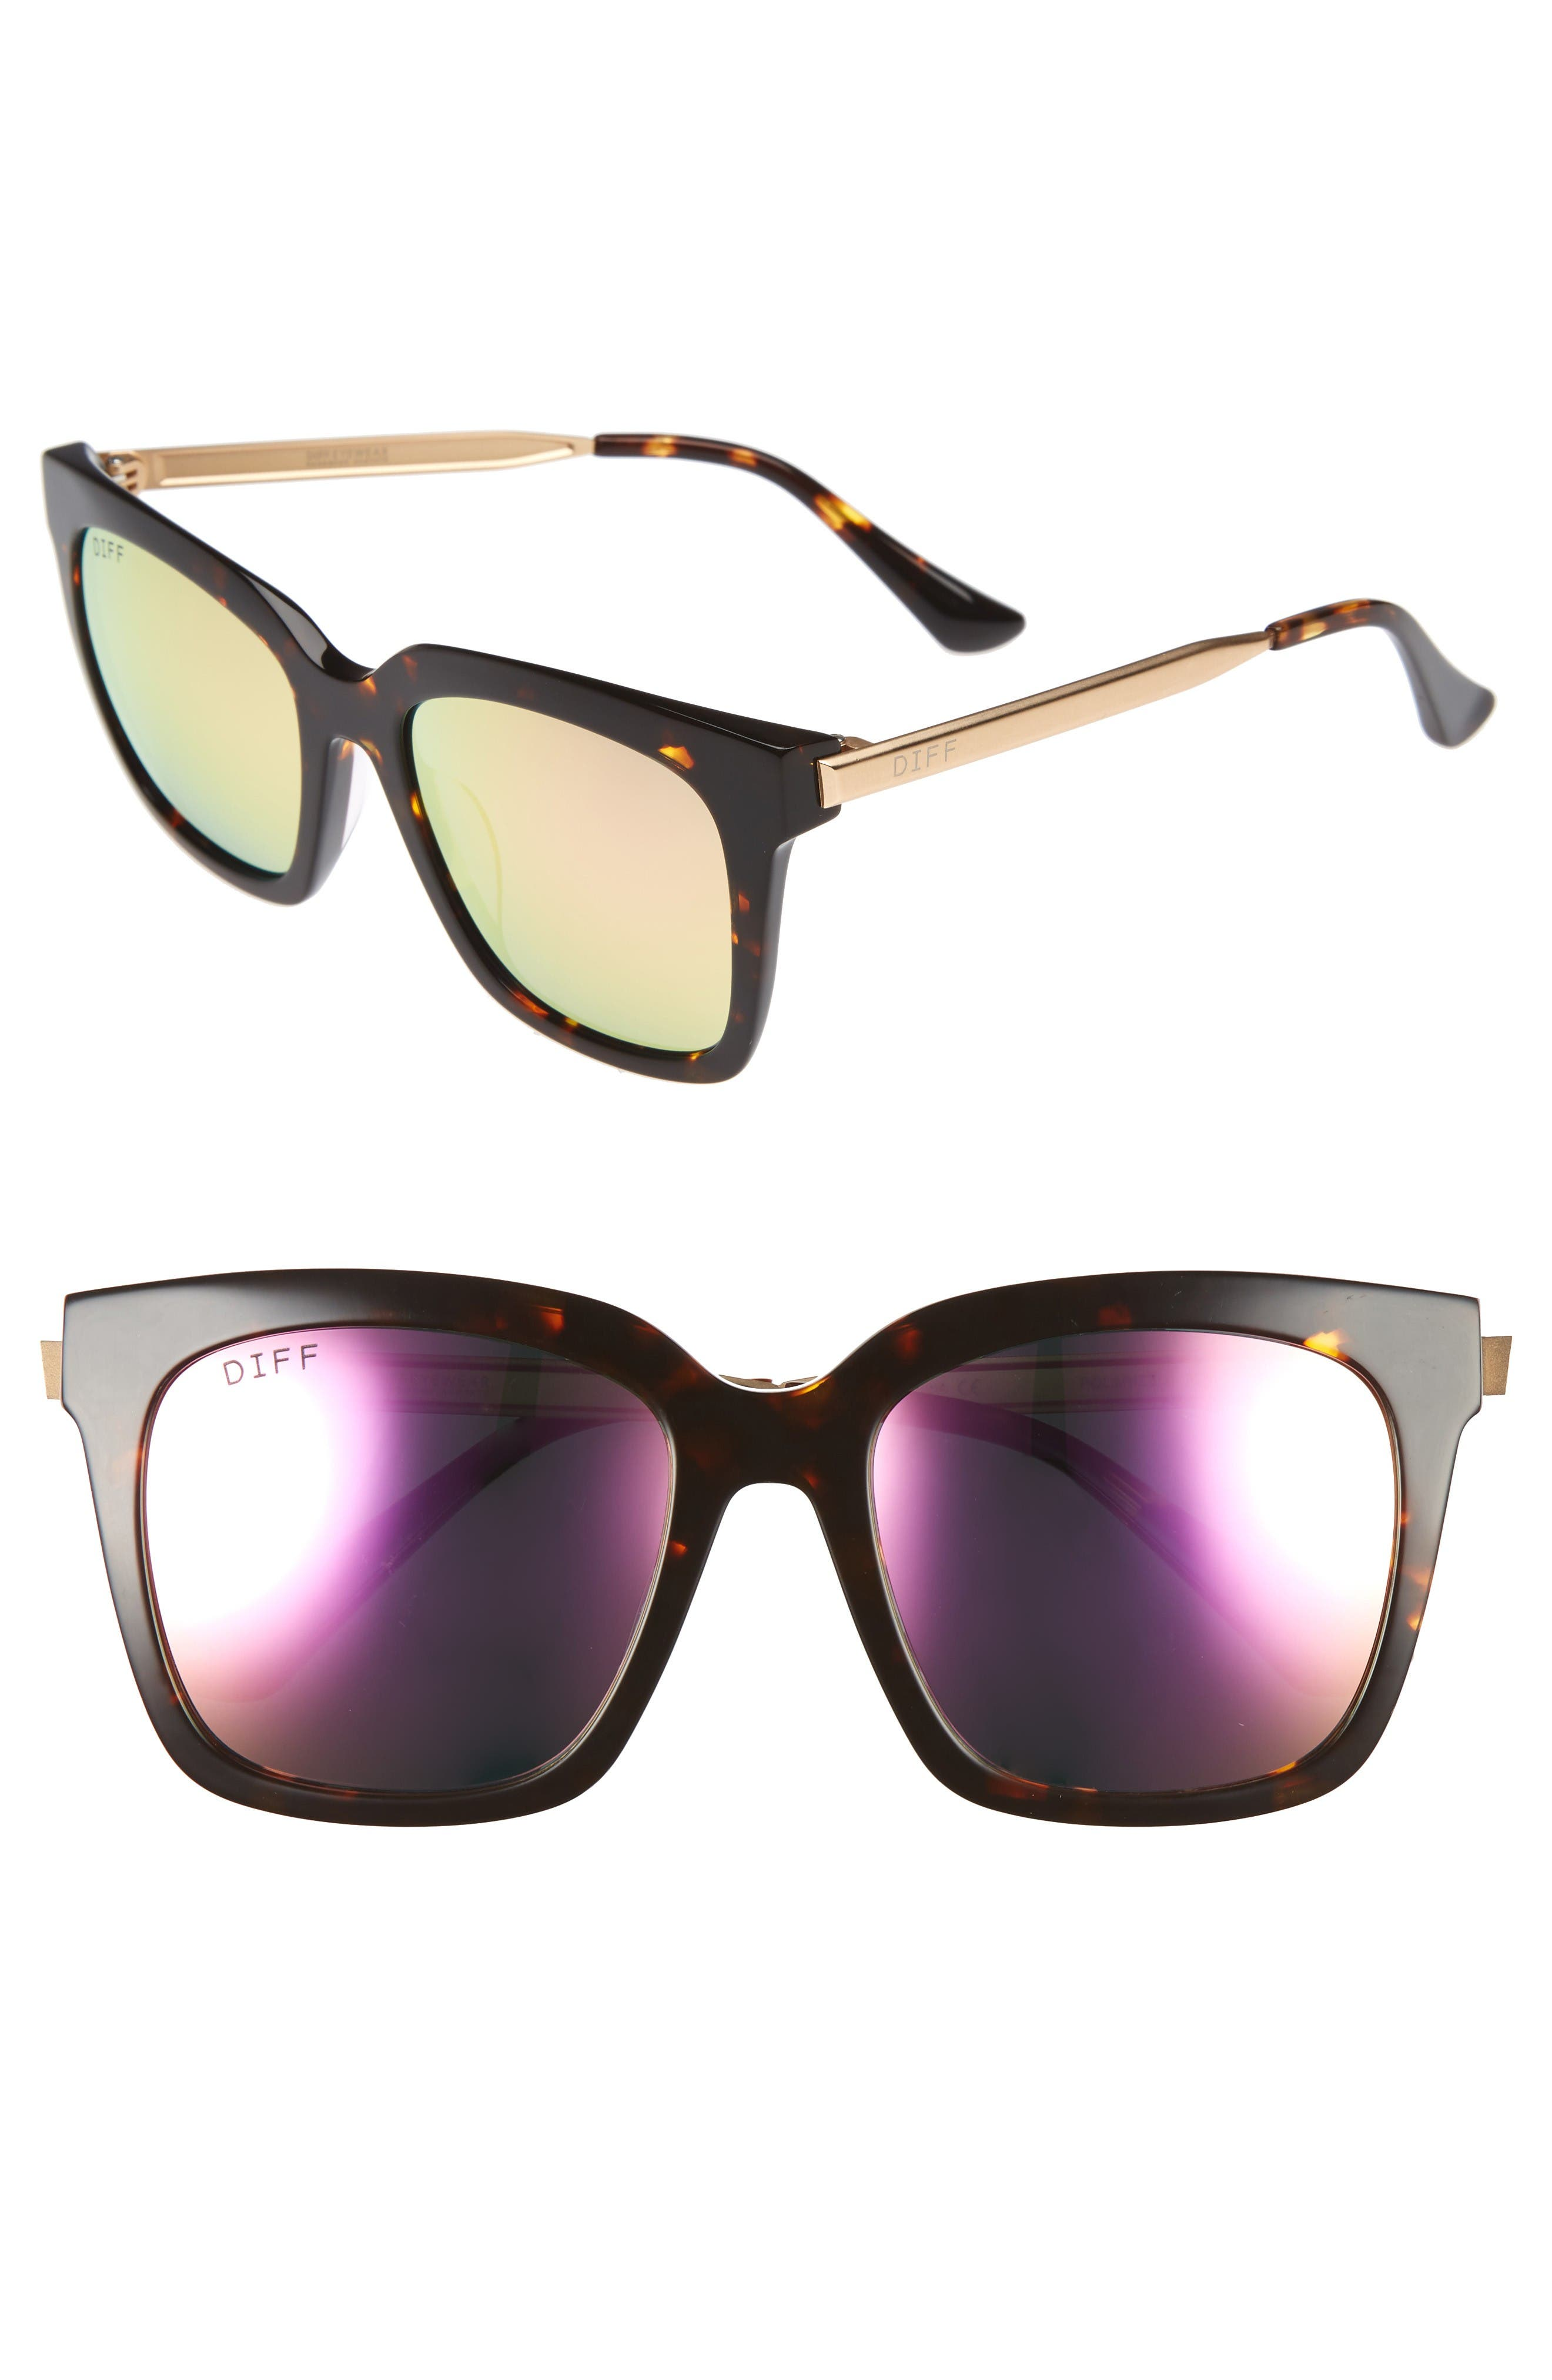 Alternate Image 1 Selected - DIFF Bella 52mm Polarized Sunglasses